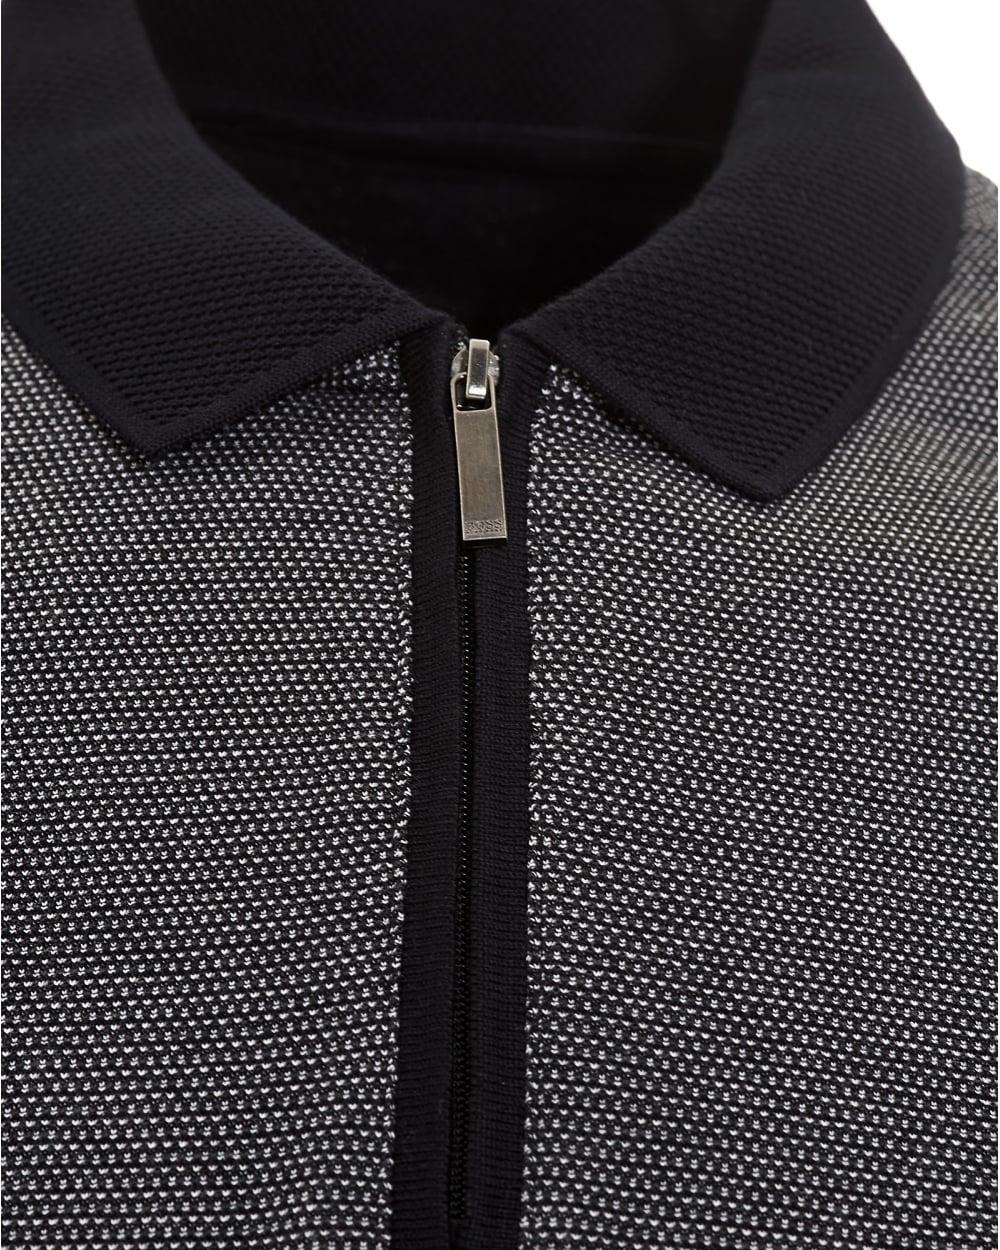 4423b2da Hugo Boss Mens Polo T Shirts - DREAMWORKS